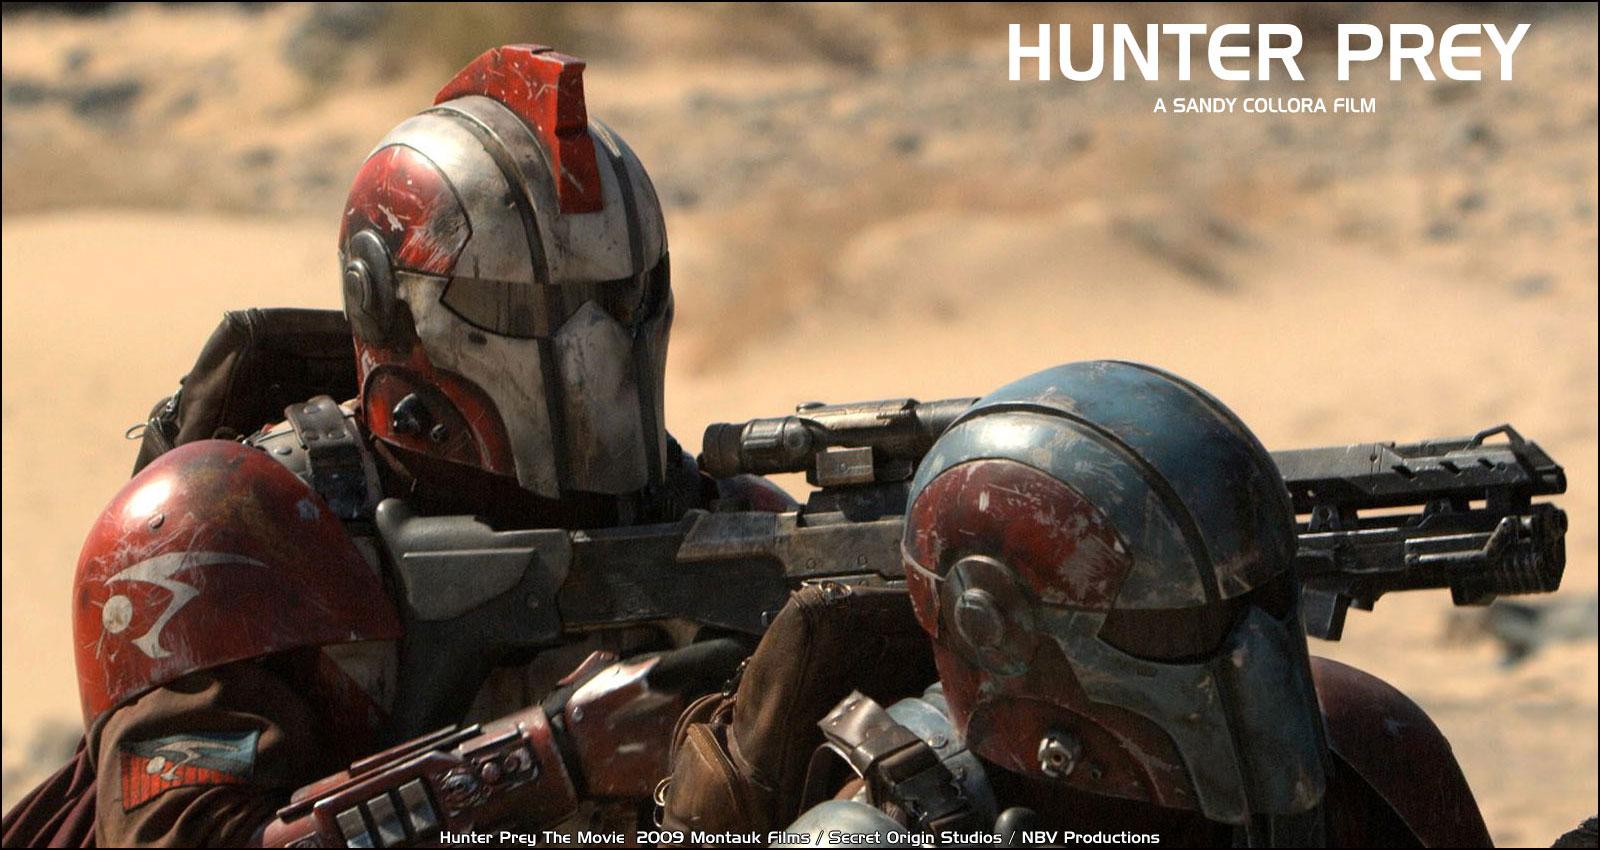 hunter prey wallpaper - photo #1